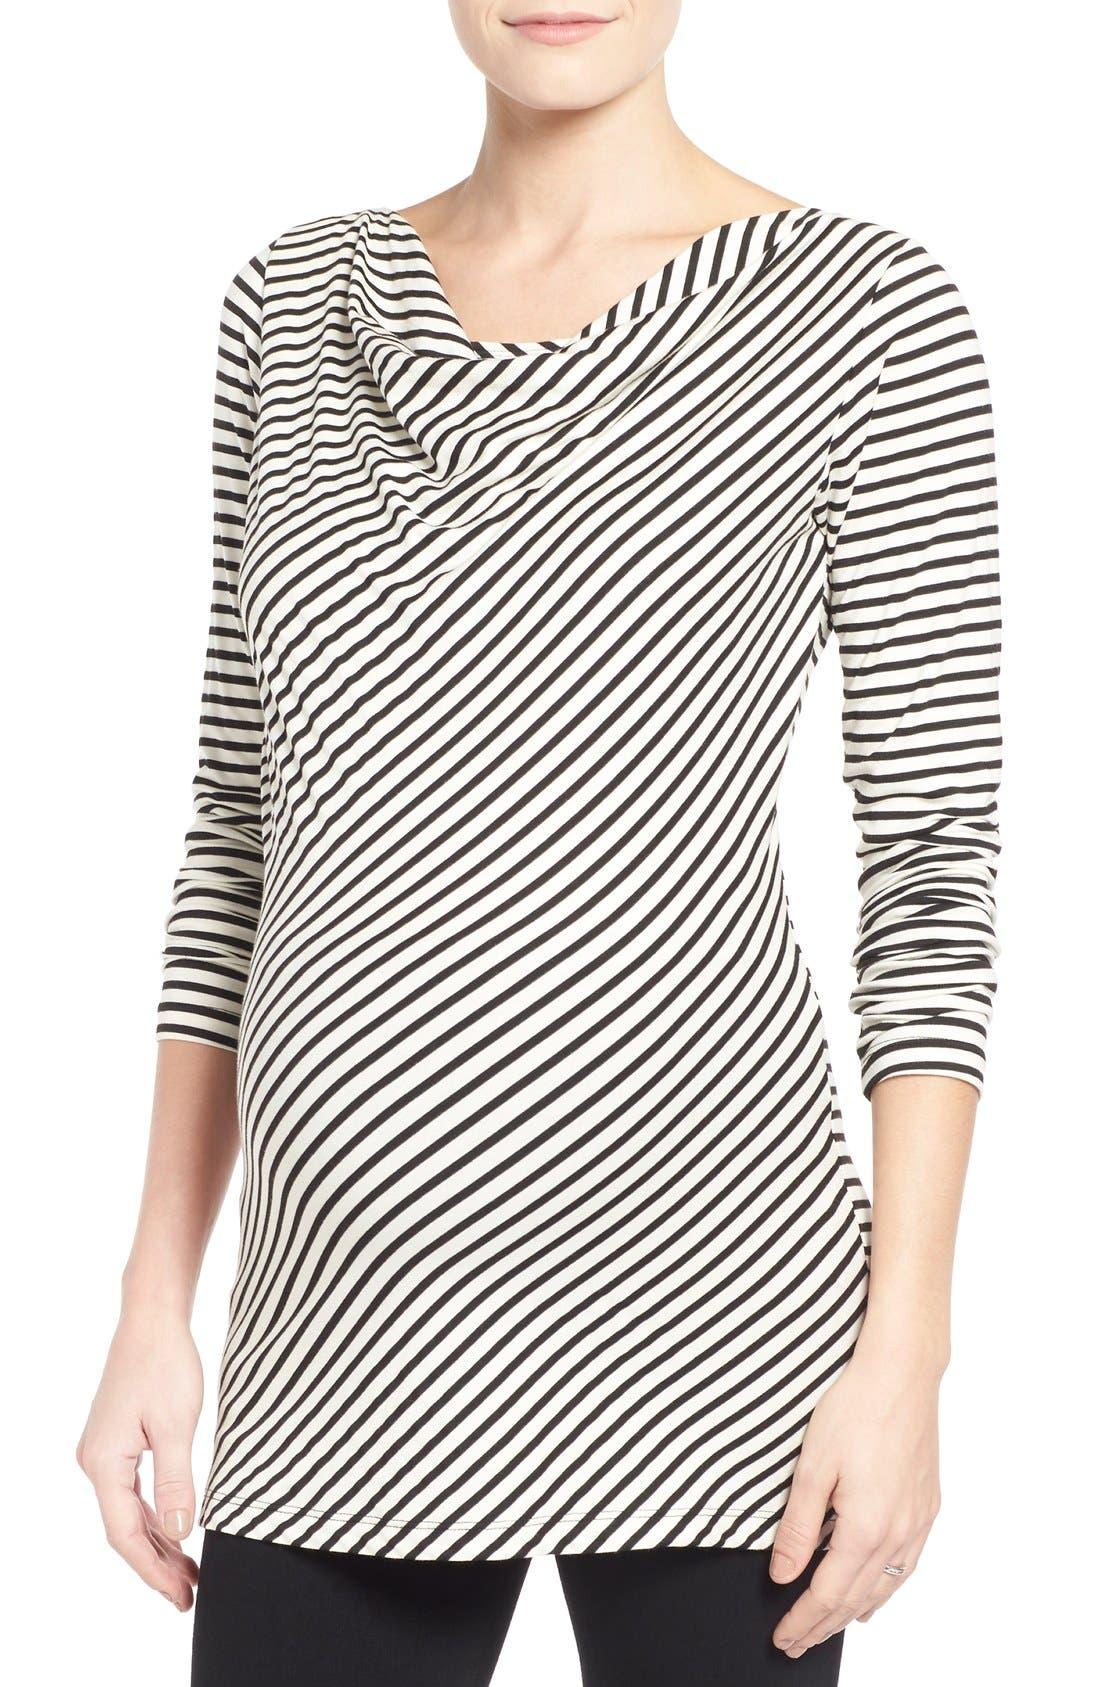 'Anne' Drape Neck Nursing Top,                         Main,                         color, Black/ White Stripe